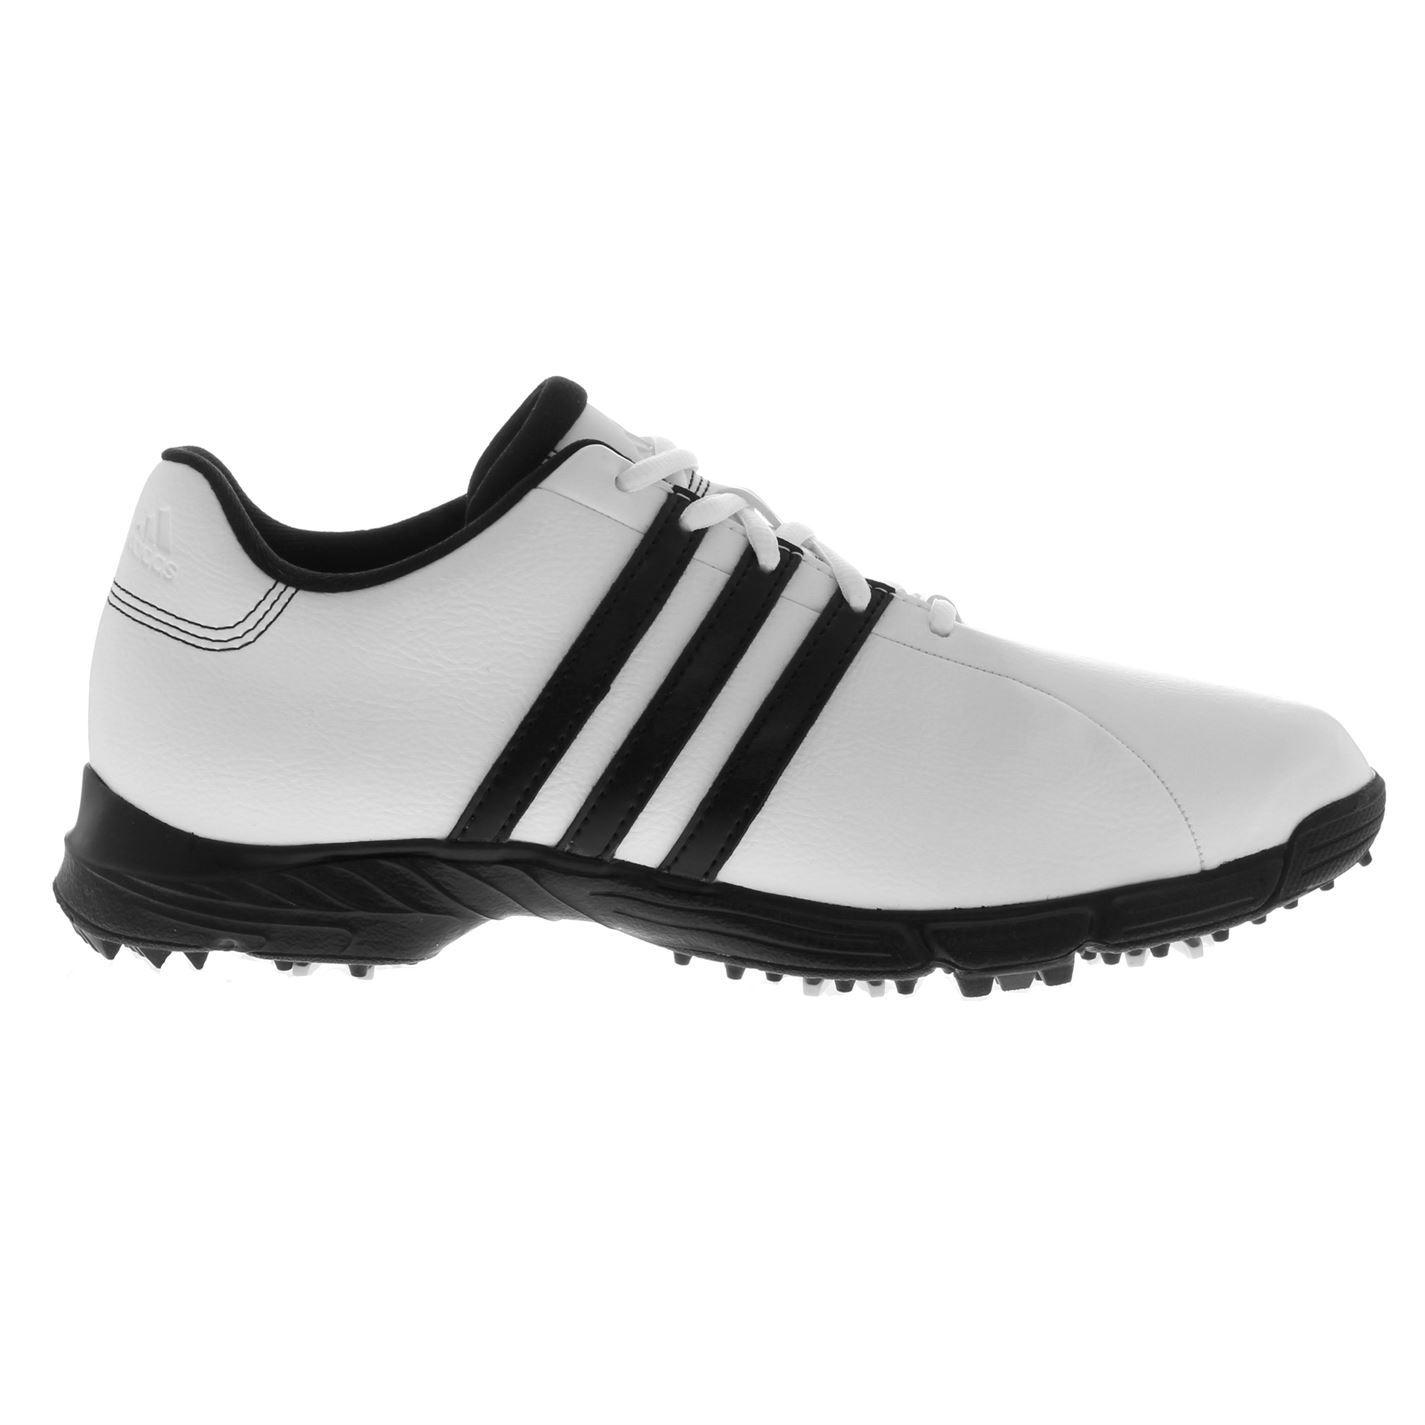 Adidas Golflite Golf Shoes Mens Spikes Footwear Ebay